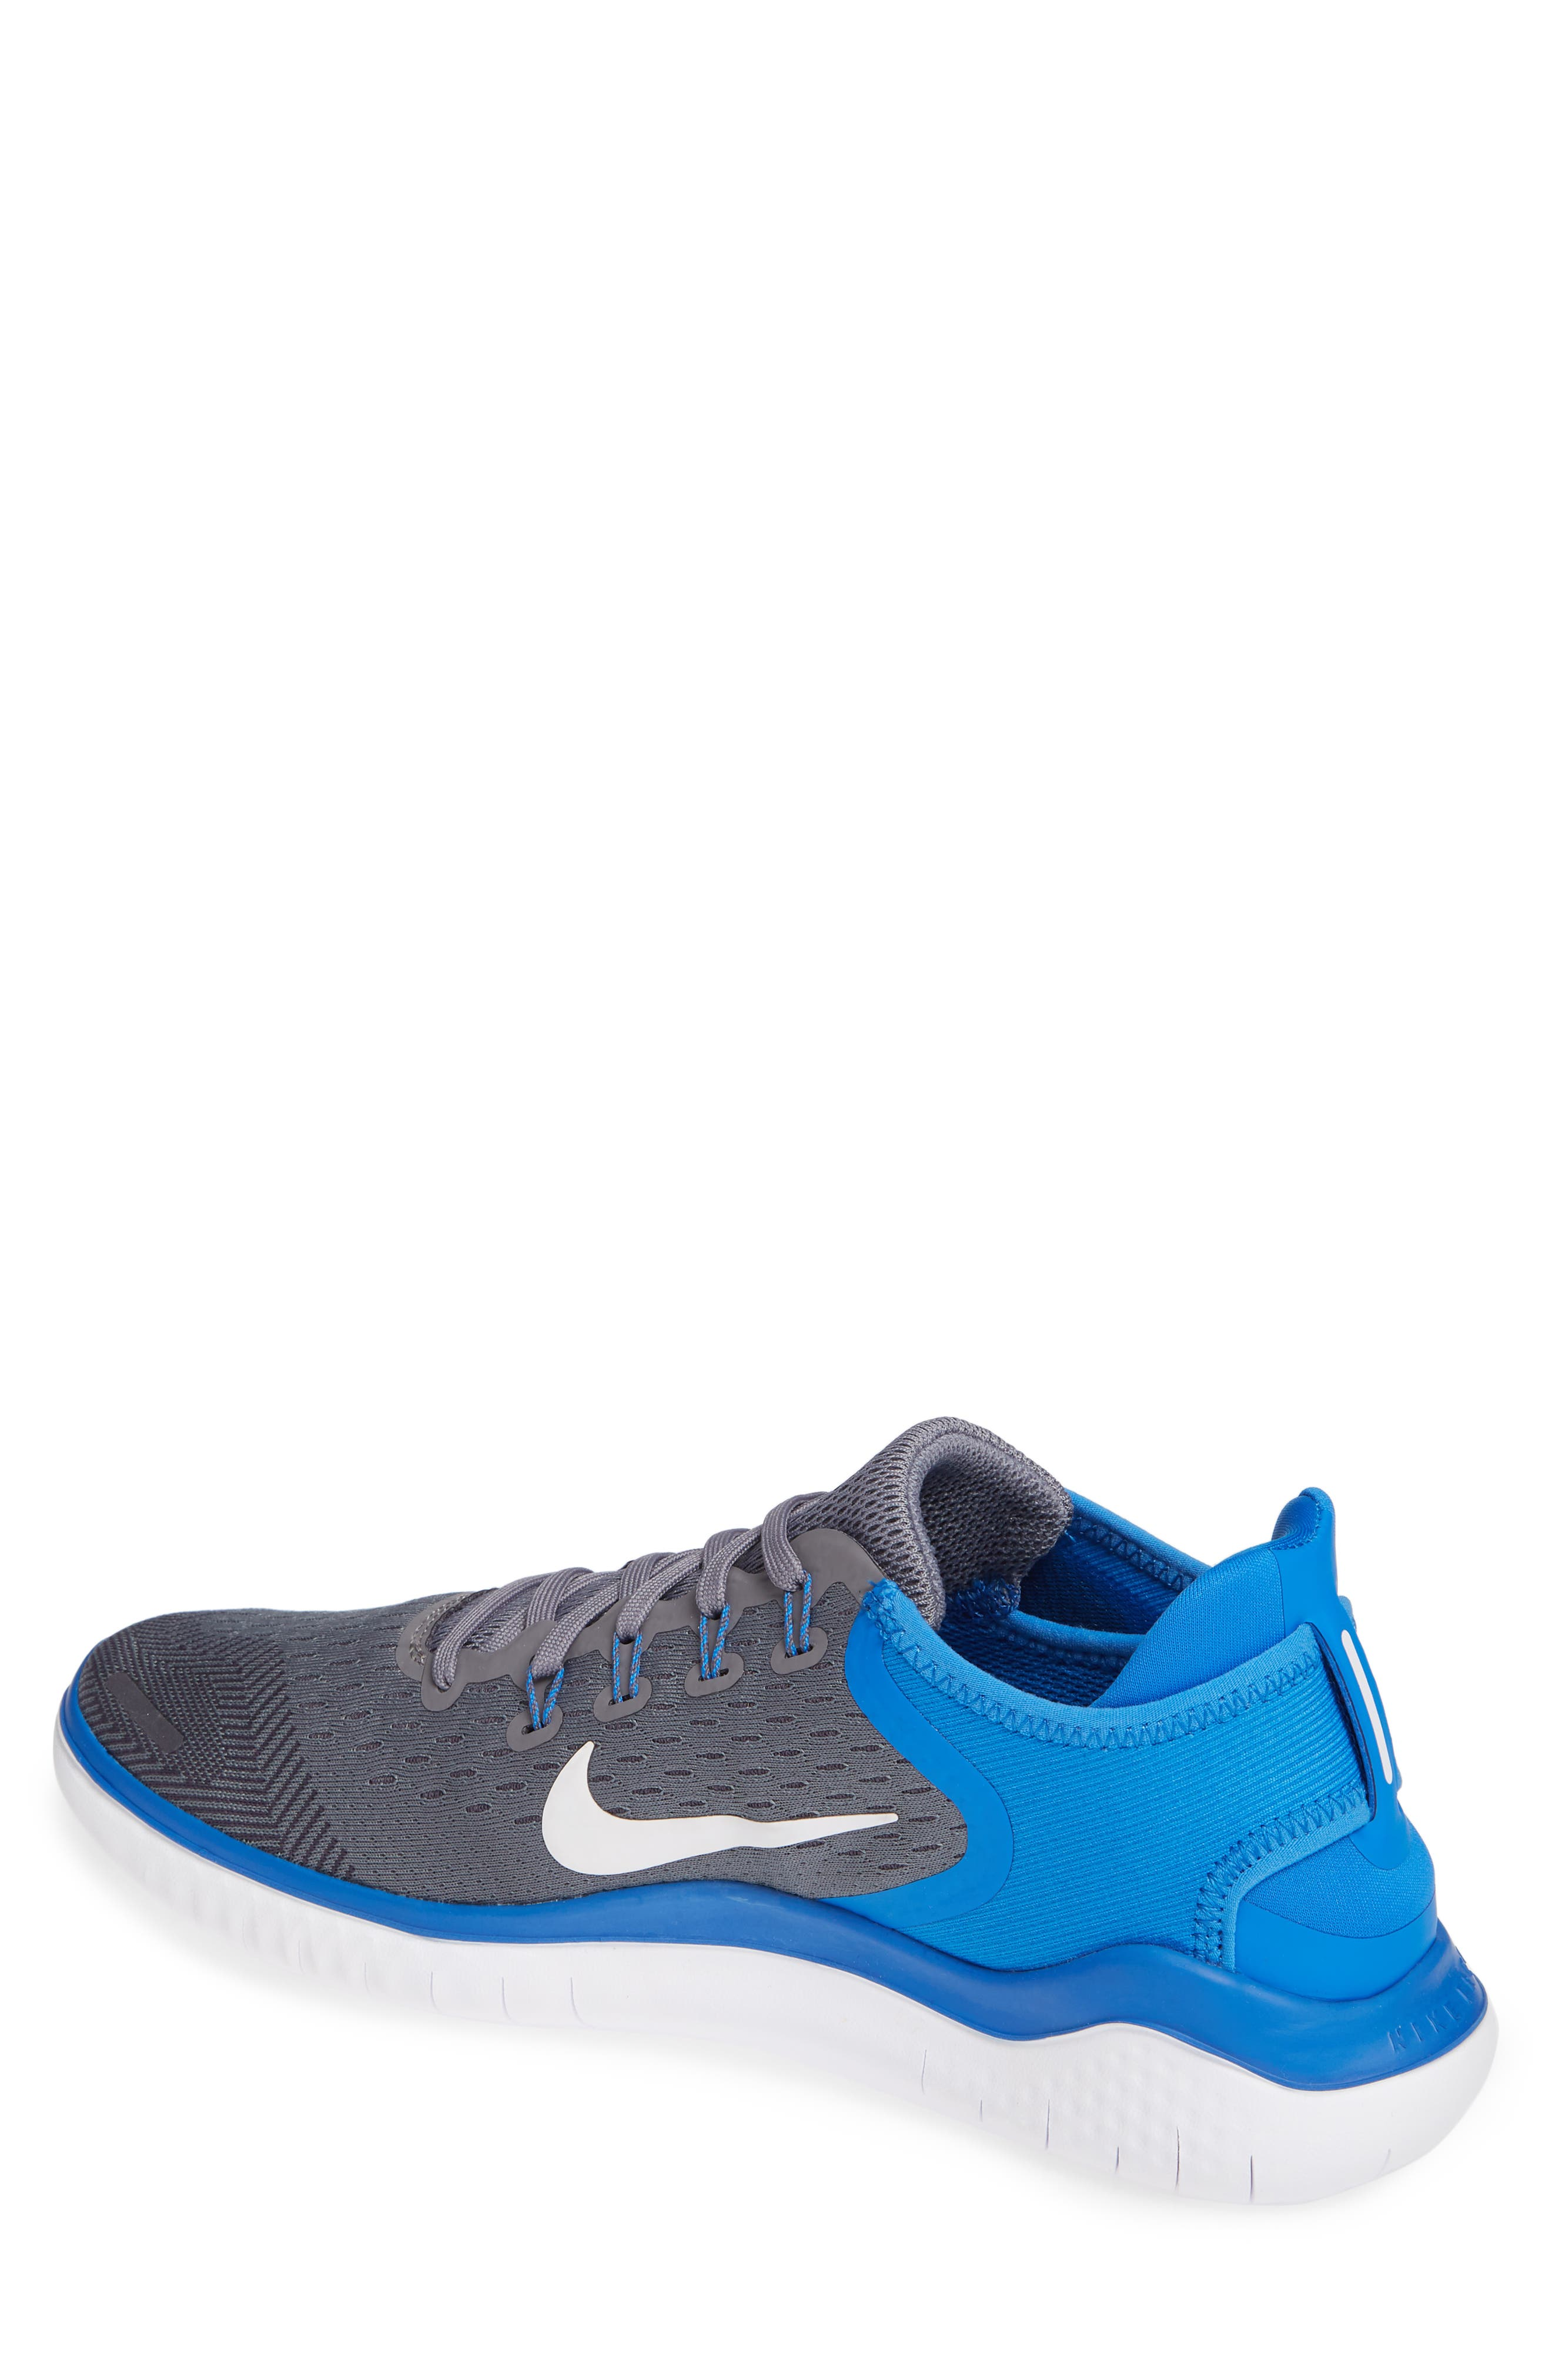 Free RN 2018 Running Shoe,                             Alternate thumbnail 2, color,                             Gunsmoke/ White/ Blue